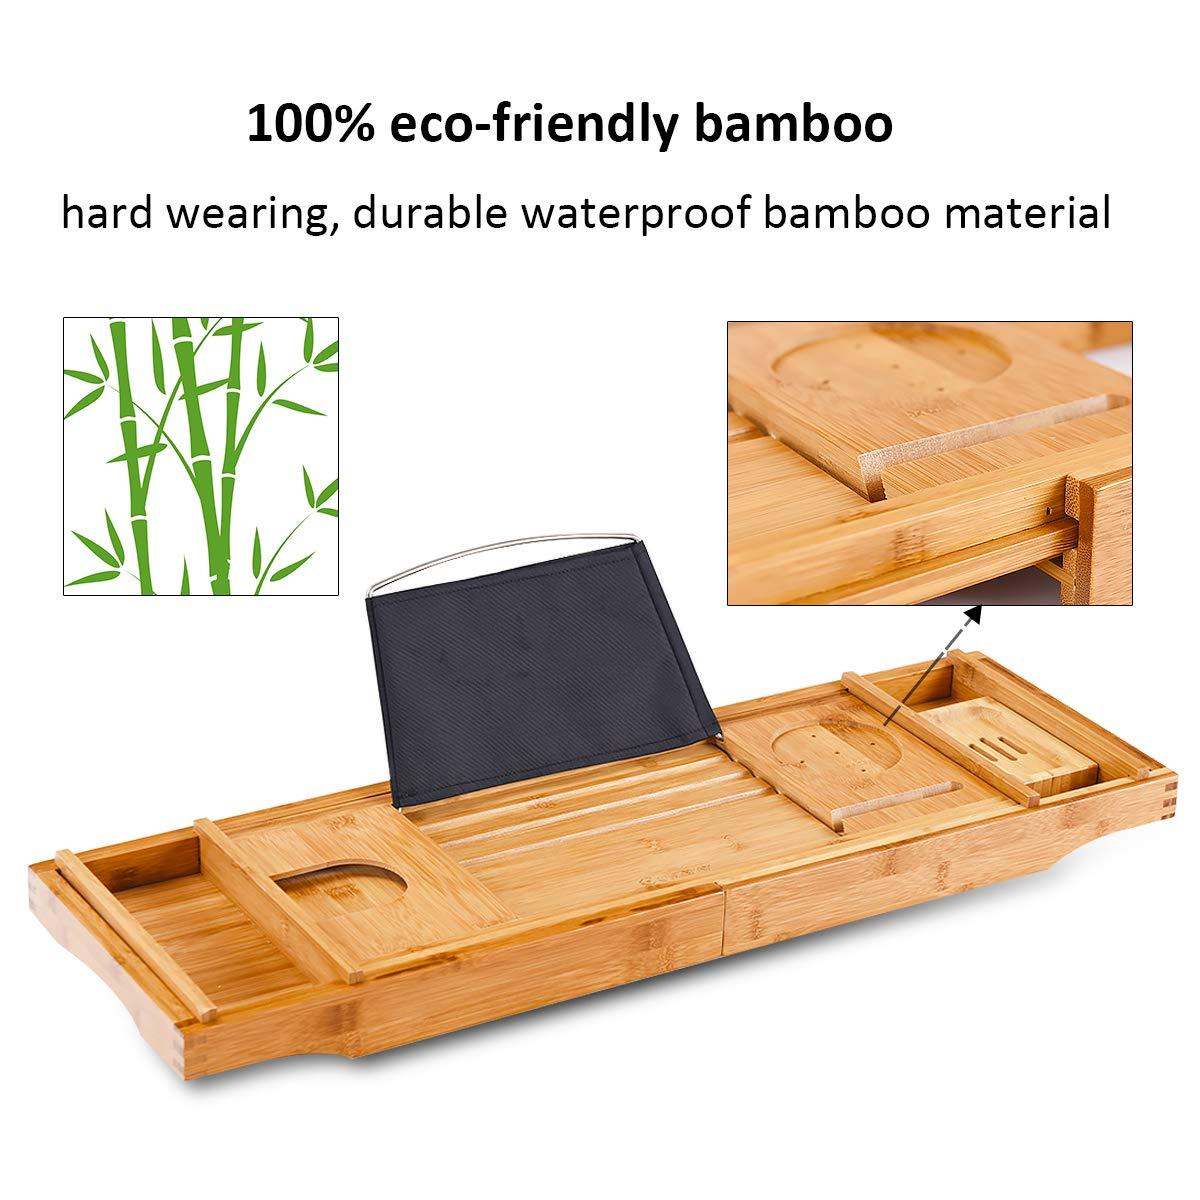 Giantex Bamboo Bathtub Tray W//Extending Sides Premium Luxury Tray Organizer for Phone and Wineglass Adjustable Book Holder Bathtub Caddy Tray